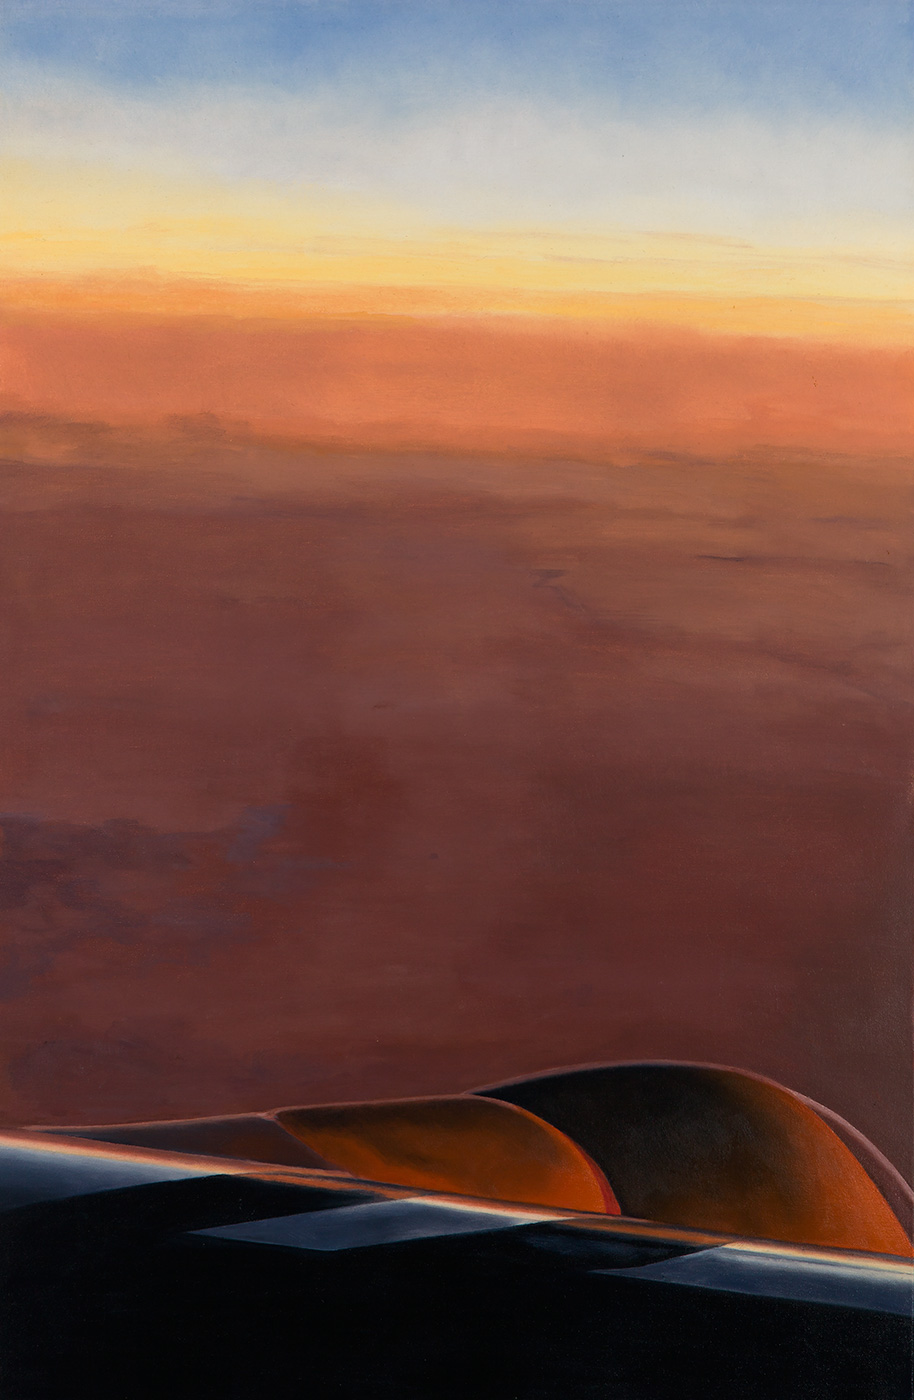 Patricia Murphy - Plane